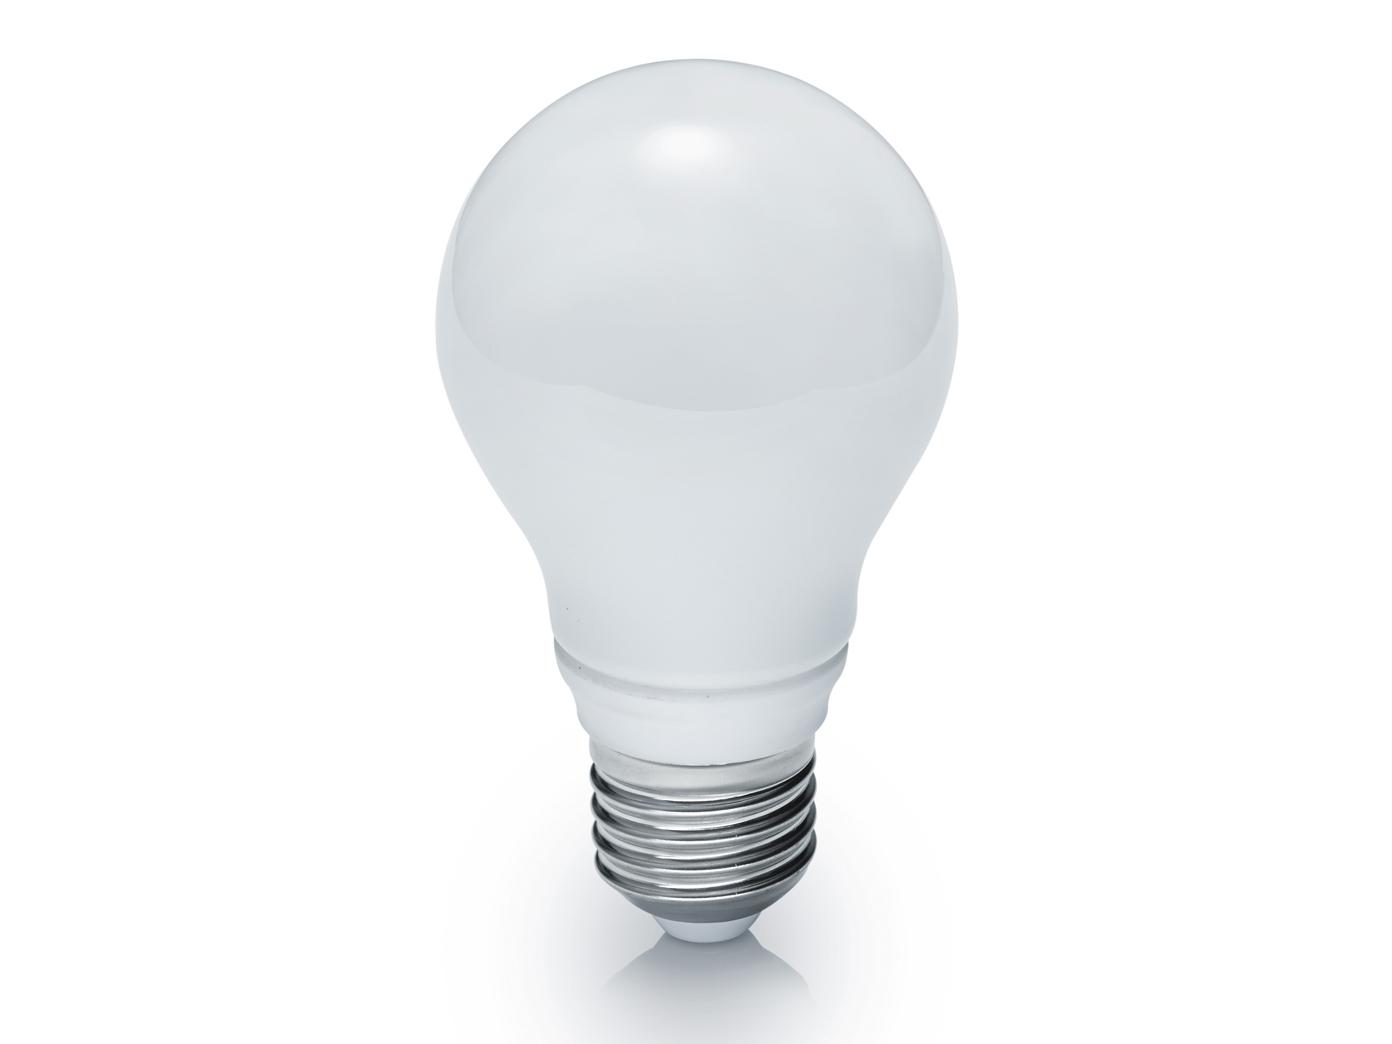 Led Lampen E27 : Led leuchtmittel 5w warmweiß e27 400 lumen 3000 kelvin ebay